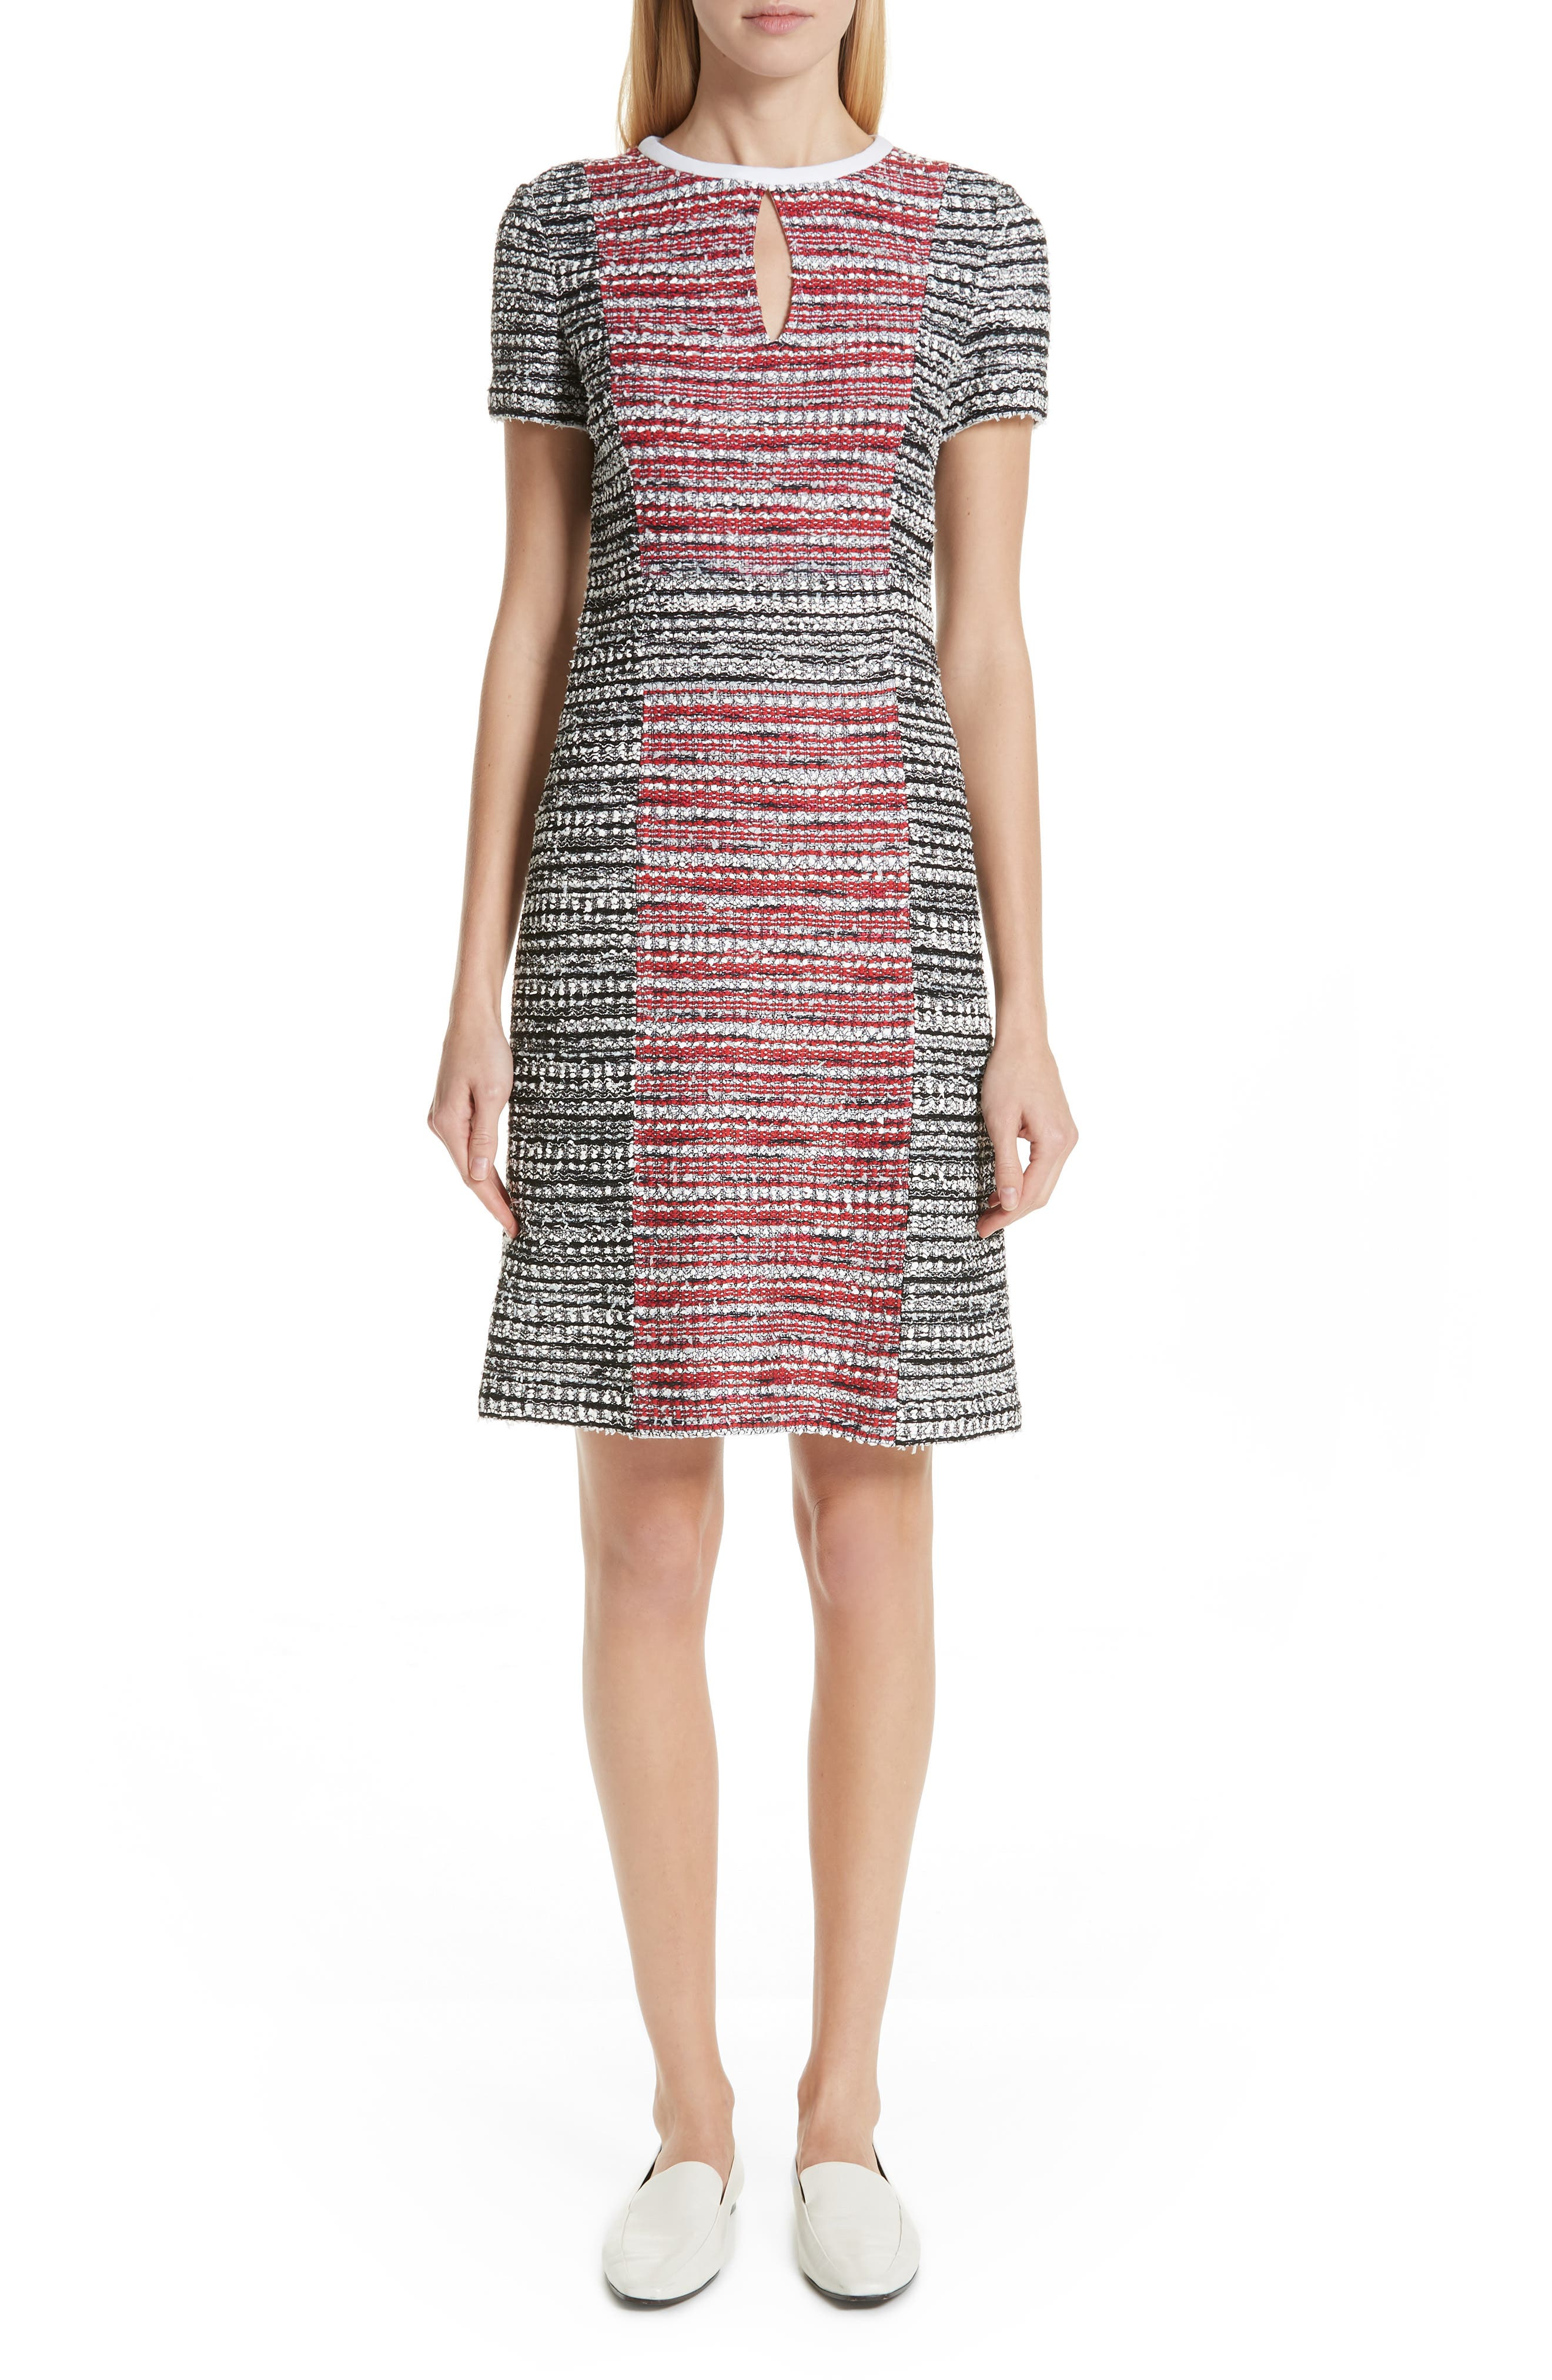 337d32b75171 St. John Collection Amelia Knit Dress